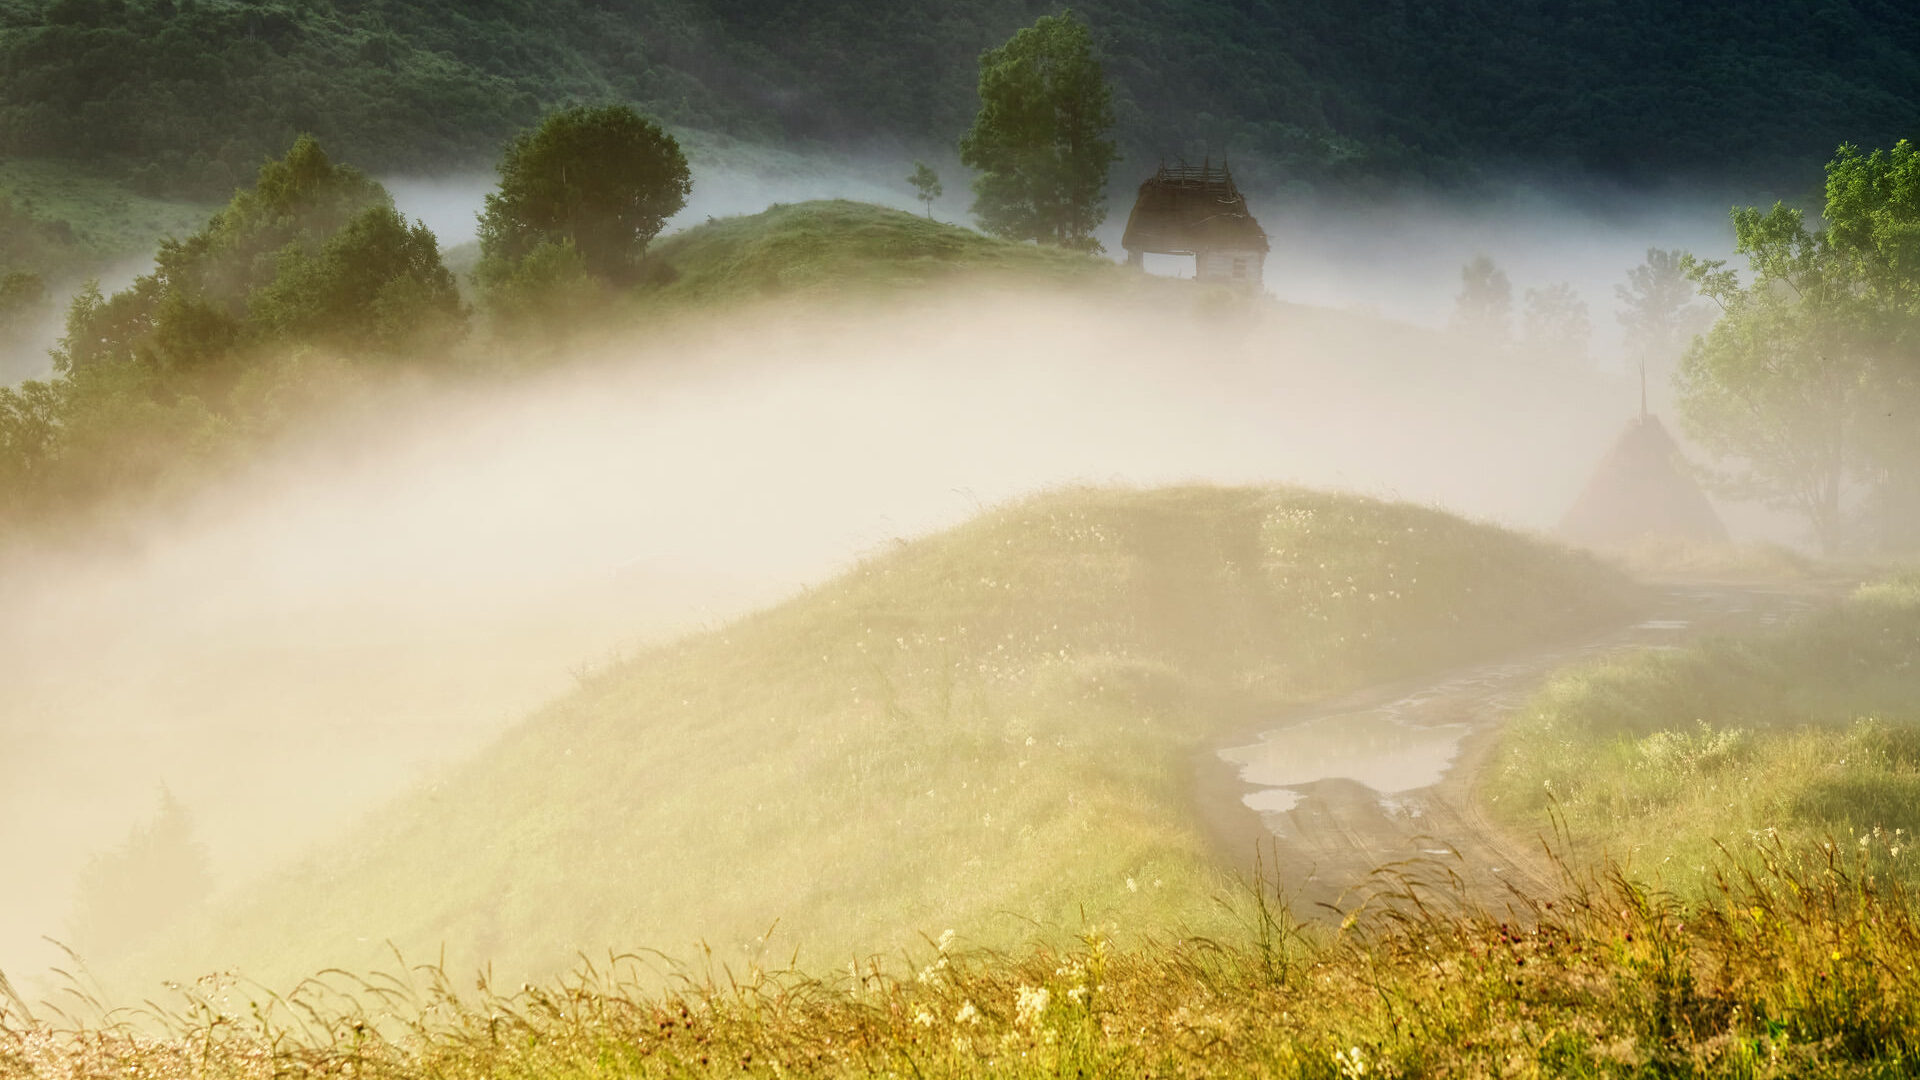 Dumesti Village - Magical Countryside of Romania